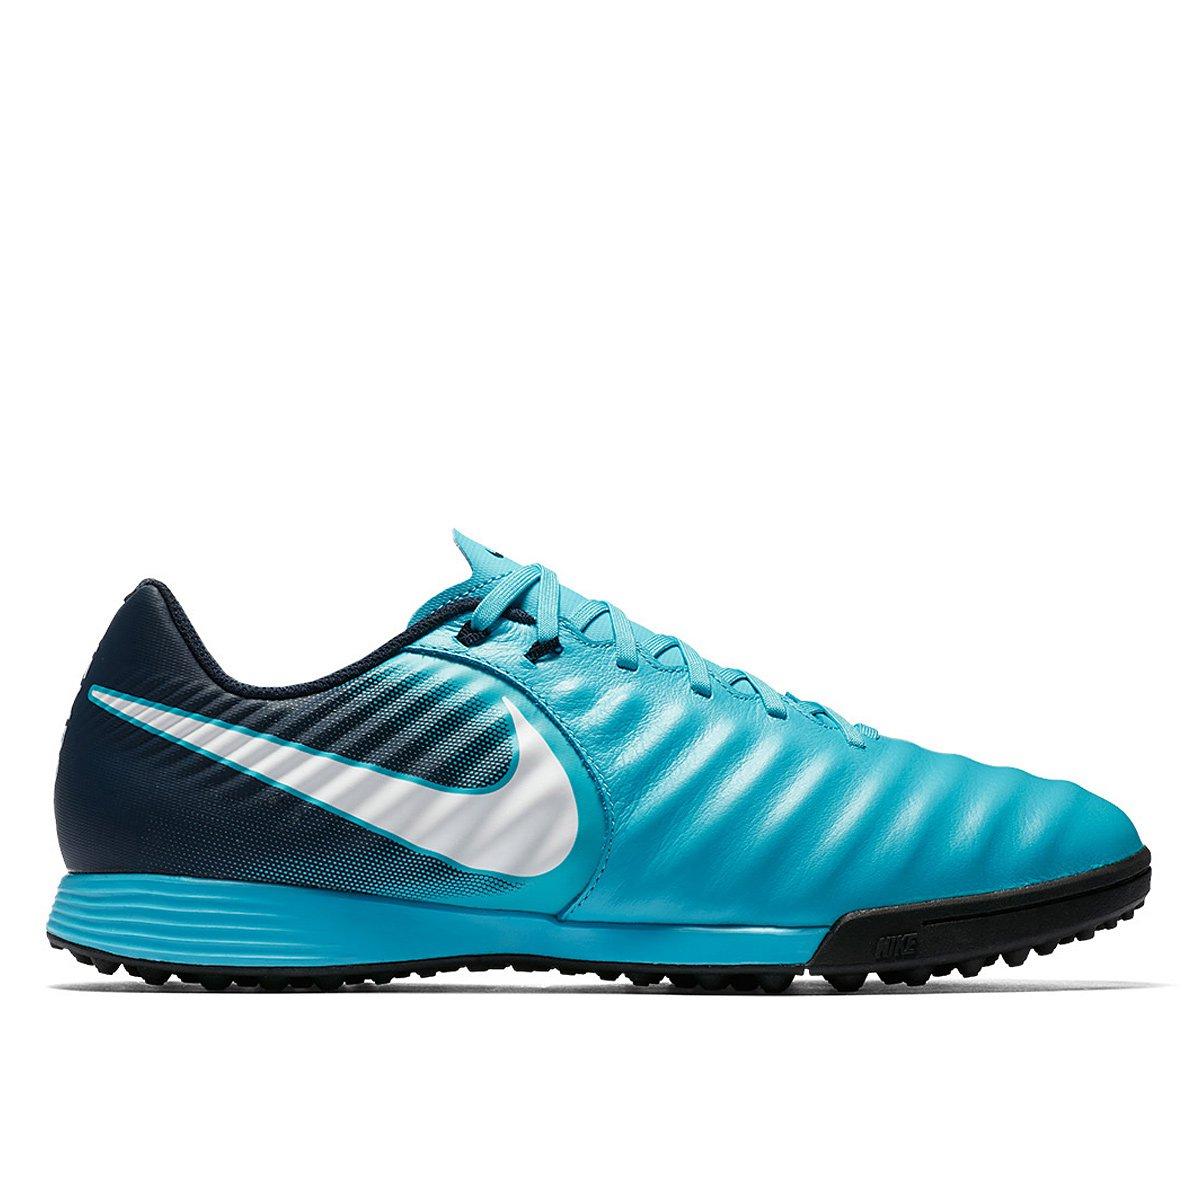 5bbf35bdb3 Chuteira Society Nike Tiempo Ligera 4 TF - Azul e Branco - Compre ...